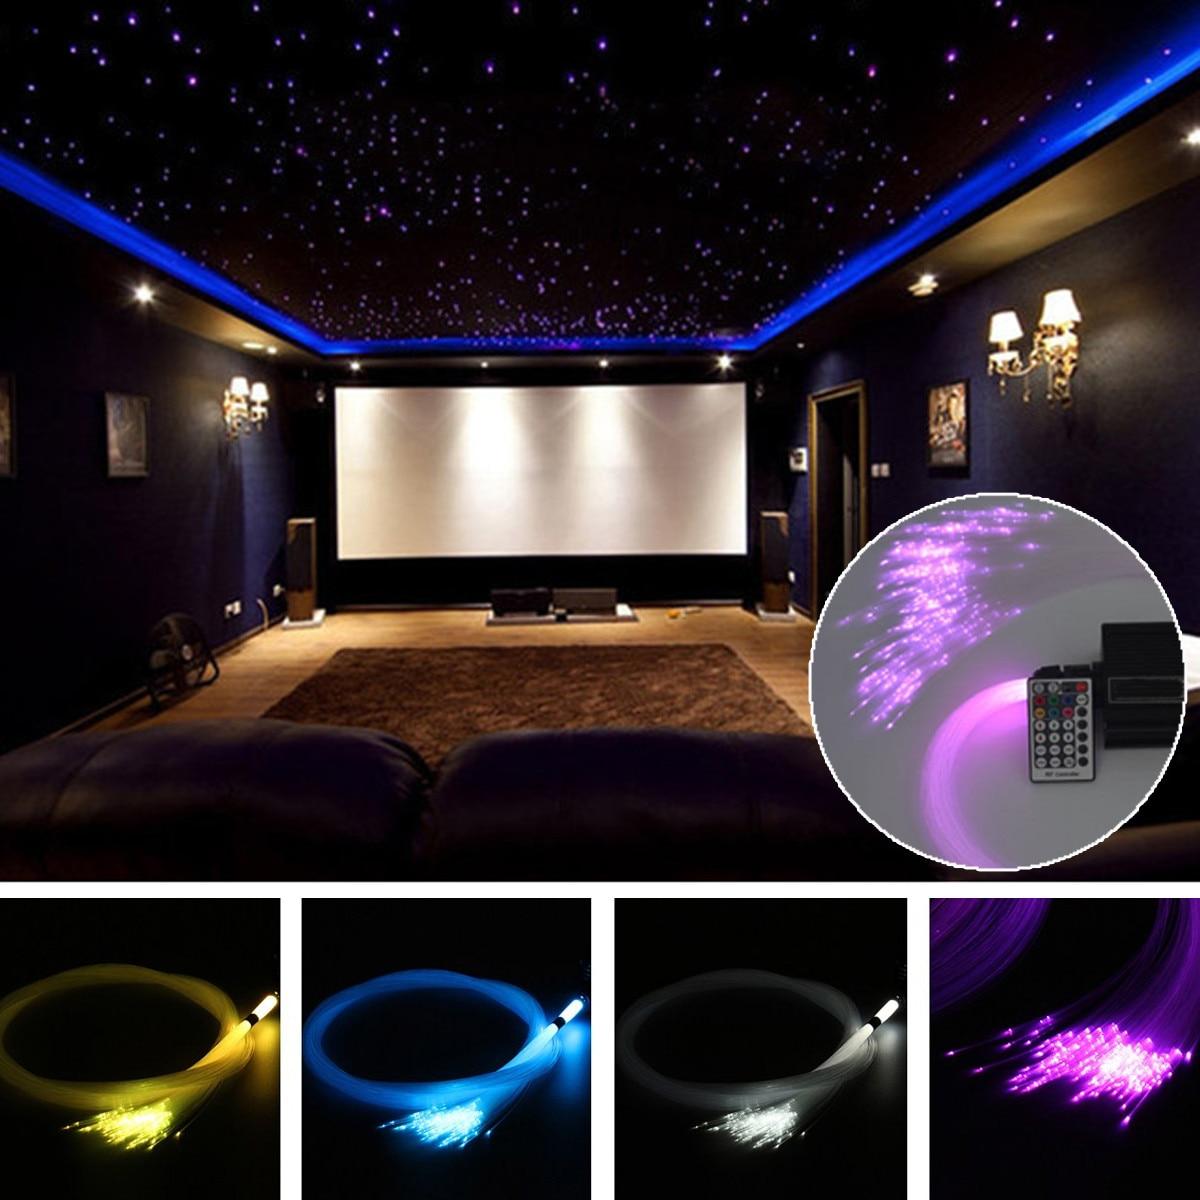 150Pcs 0.75mm X 2m RGB Fiber Optic Lights DIY  LED Strips Star Ceiling Light  Decoration Kit For Fiber Optic Light Machine